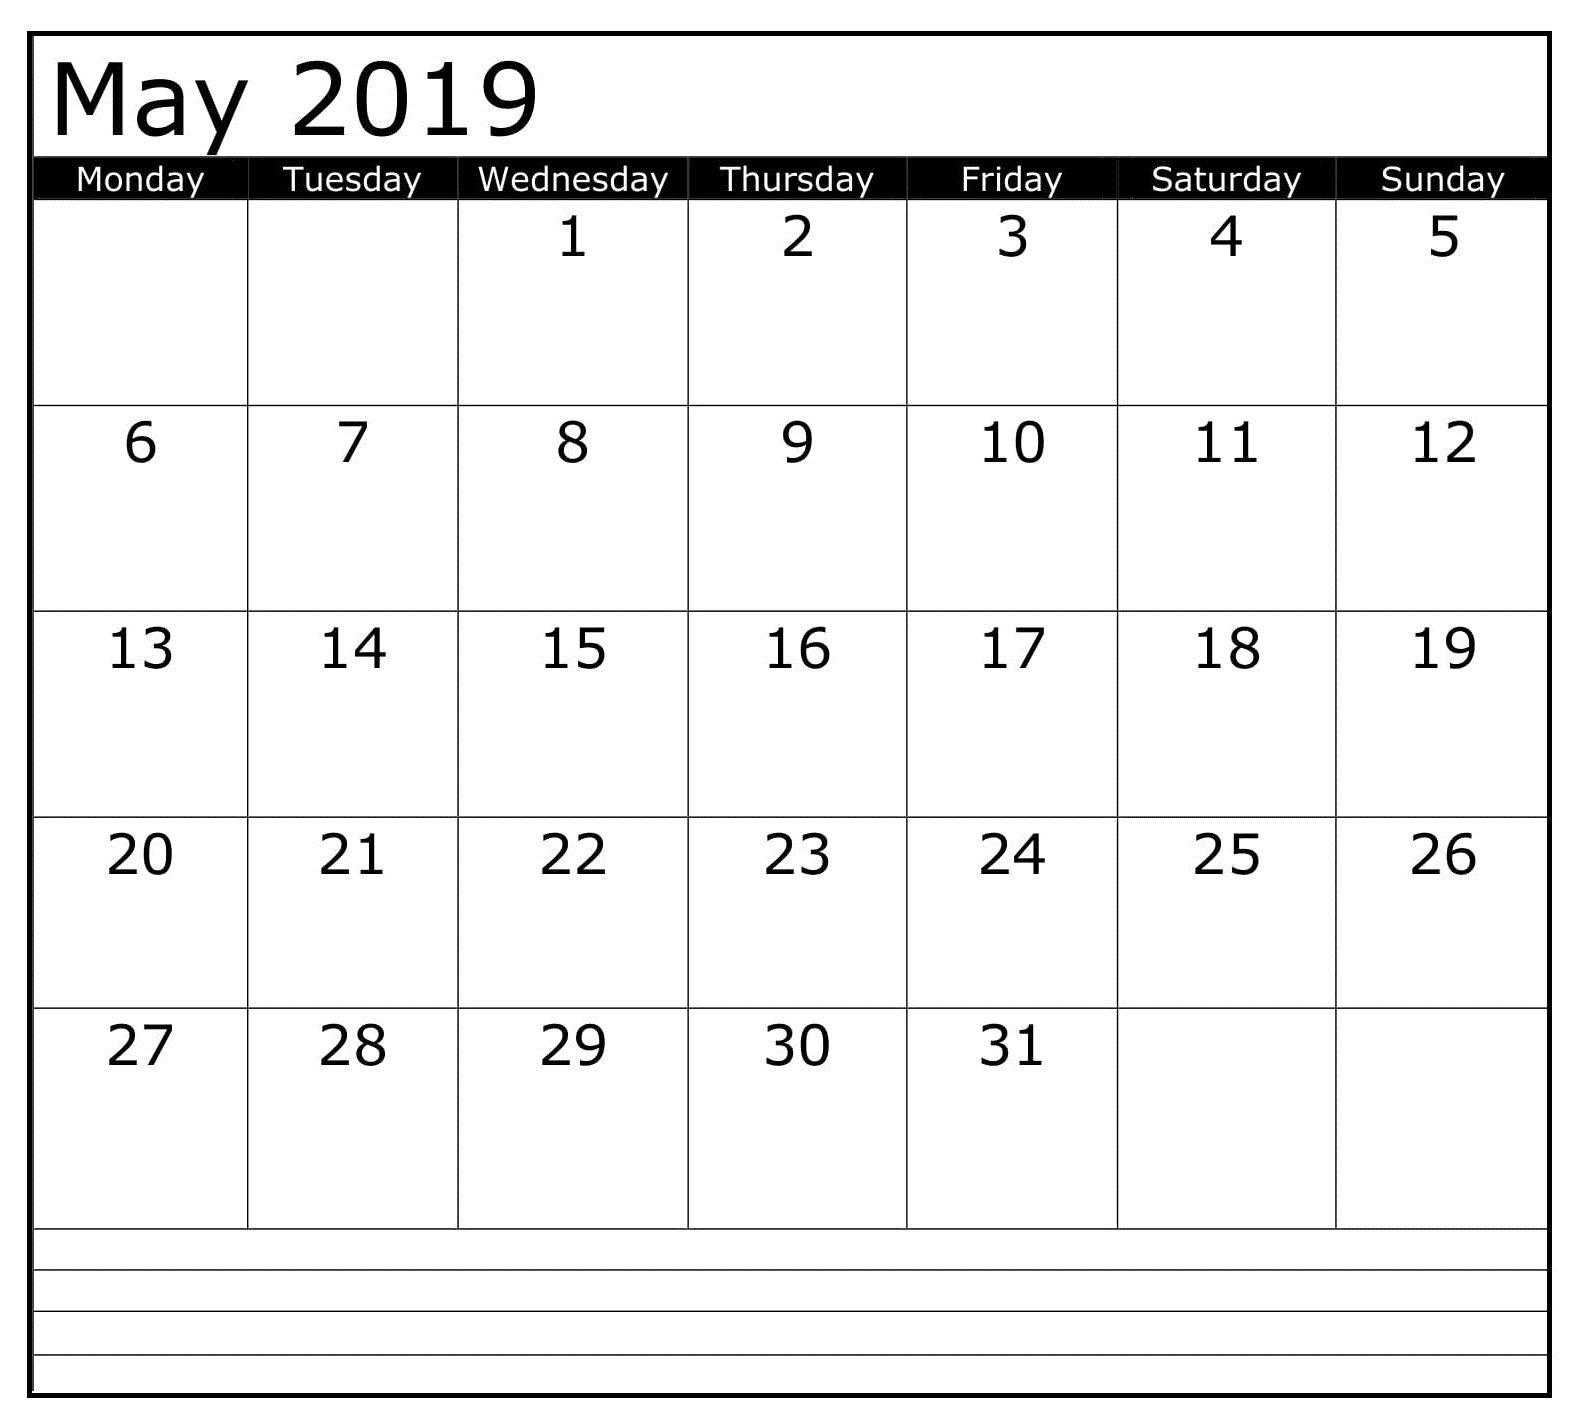 May Printable Blank 2019 Calendar Calendar 2019 Template